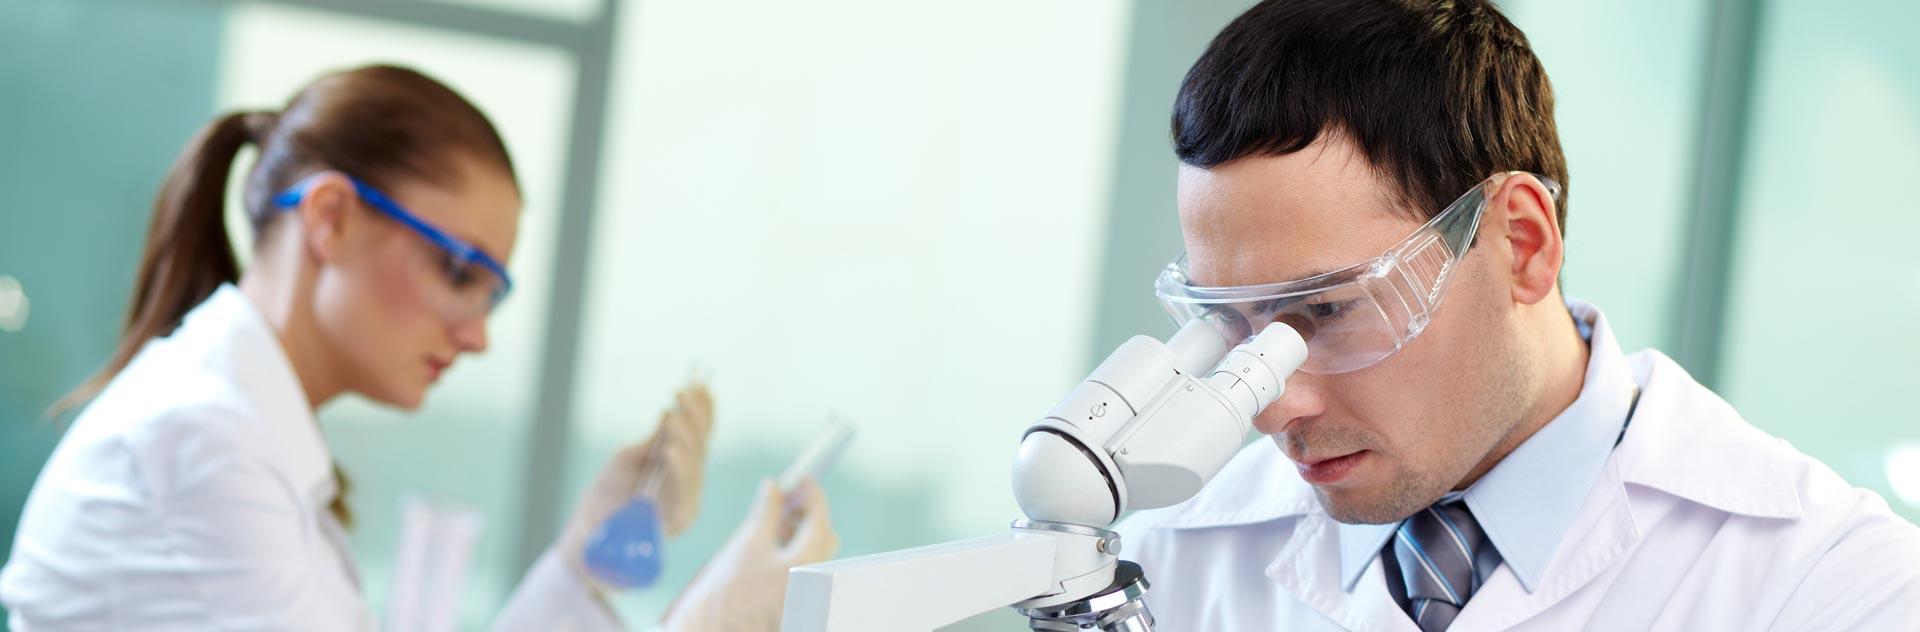 Dónde puedes encontrar la clínica capilar Capilárea